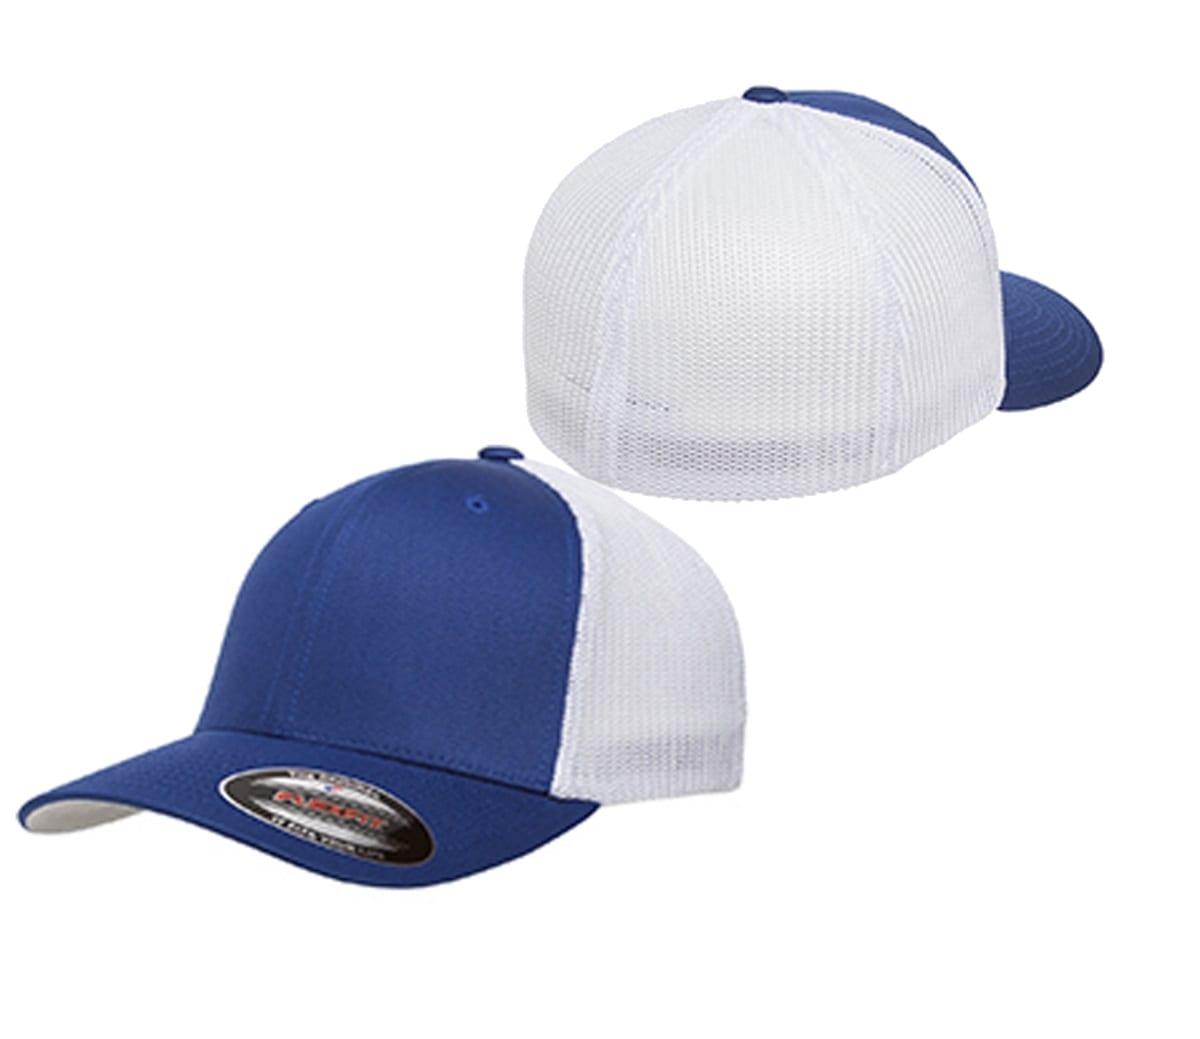 ac84b67f74433 custom hats flexfit 6511 6-panel custom trucker hat bulk custom shirts  royal white front